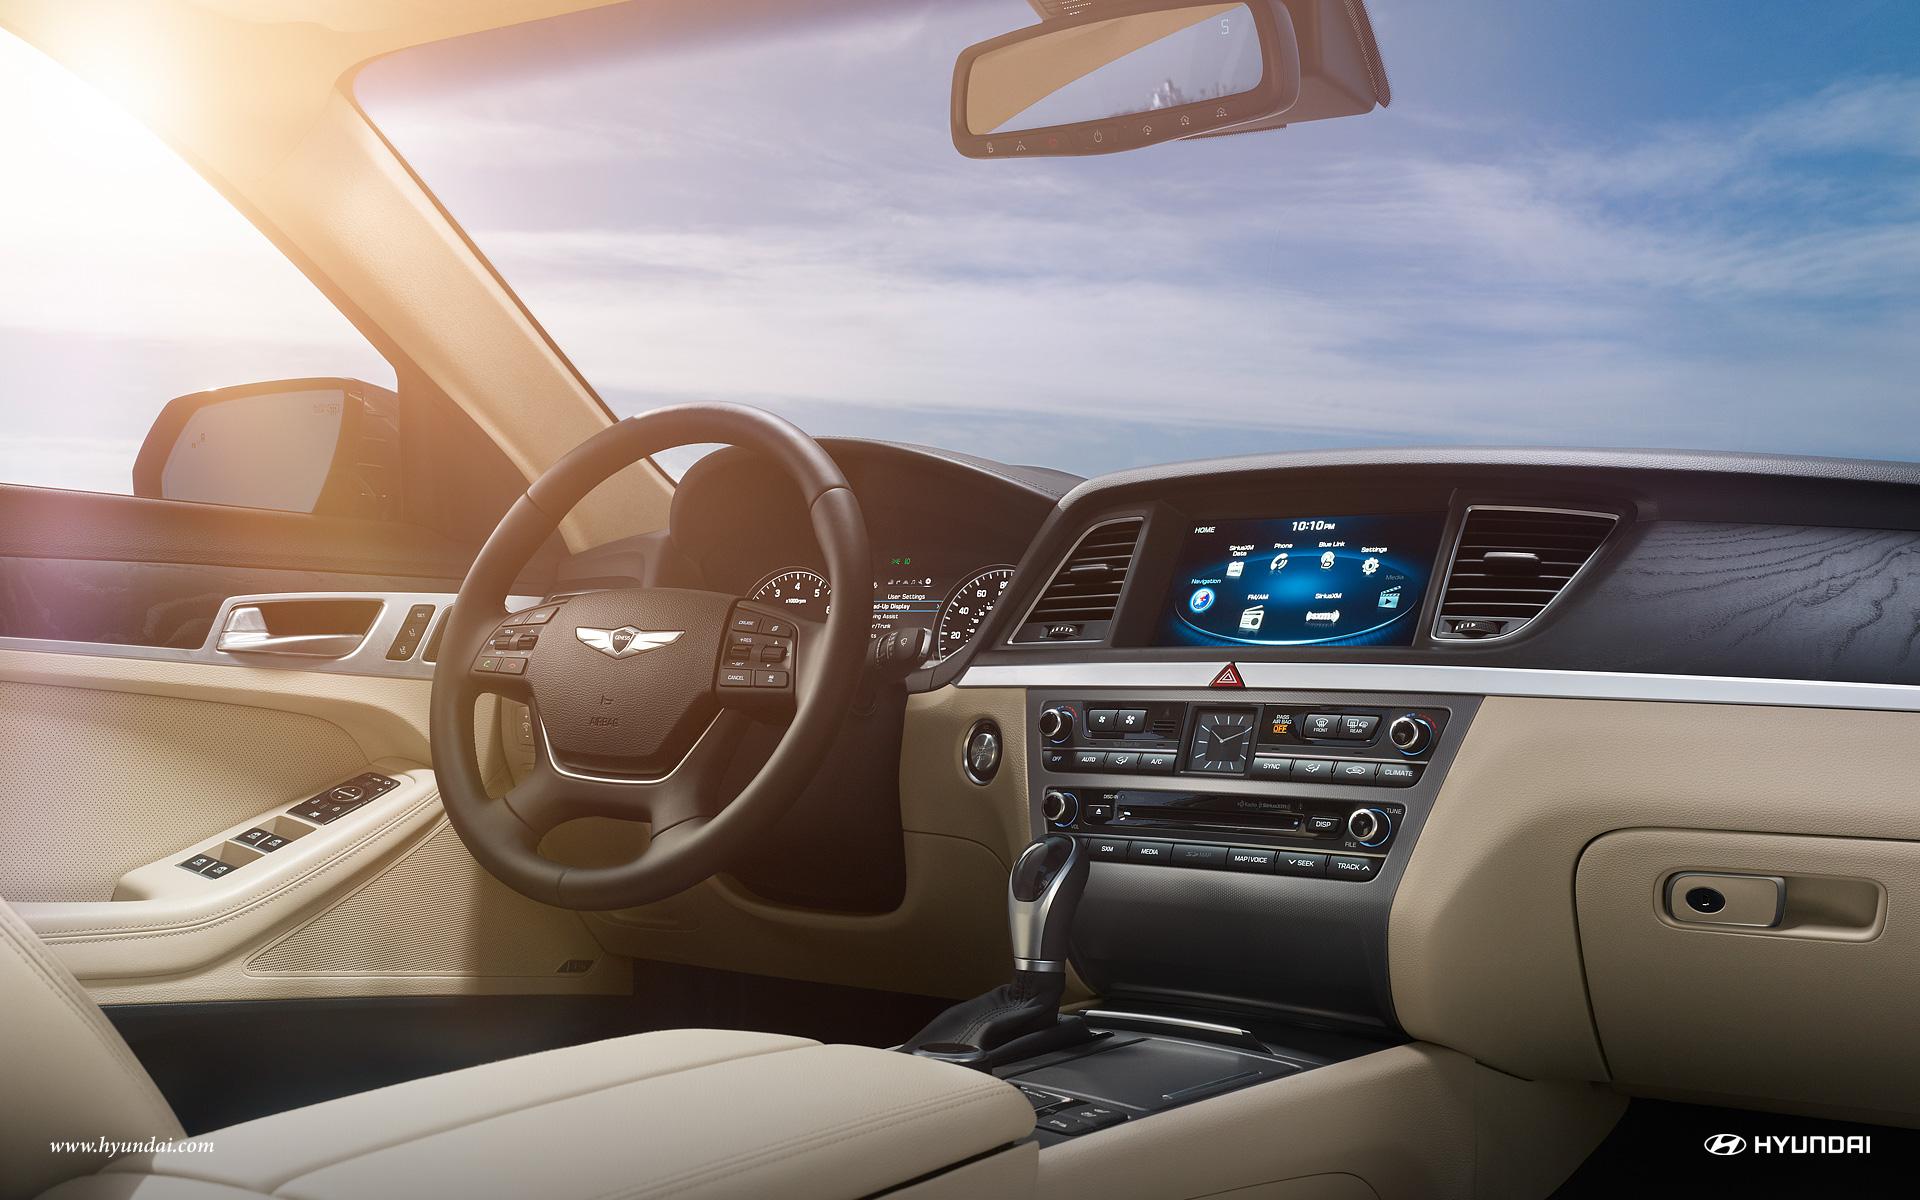 New Hyundai Genesis Interior Main Image